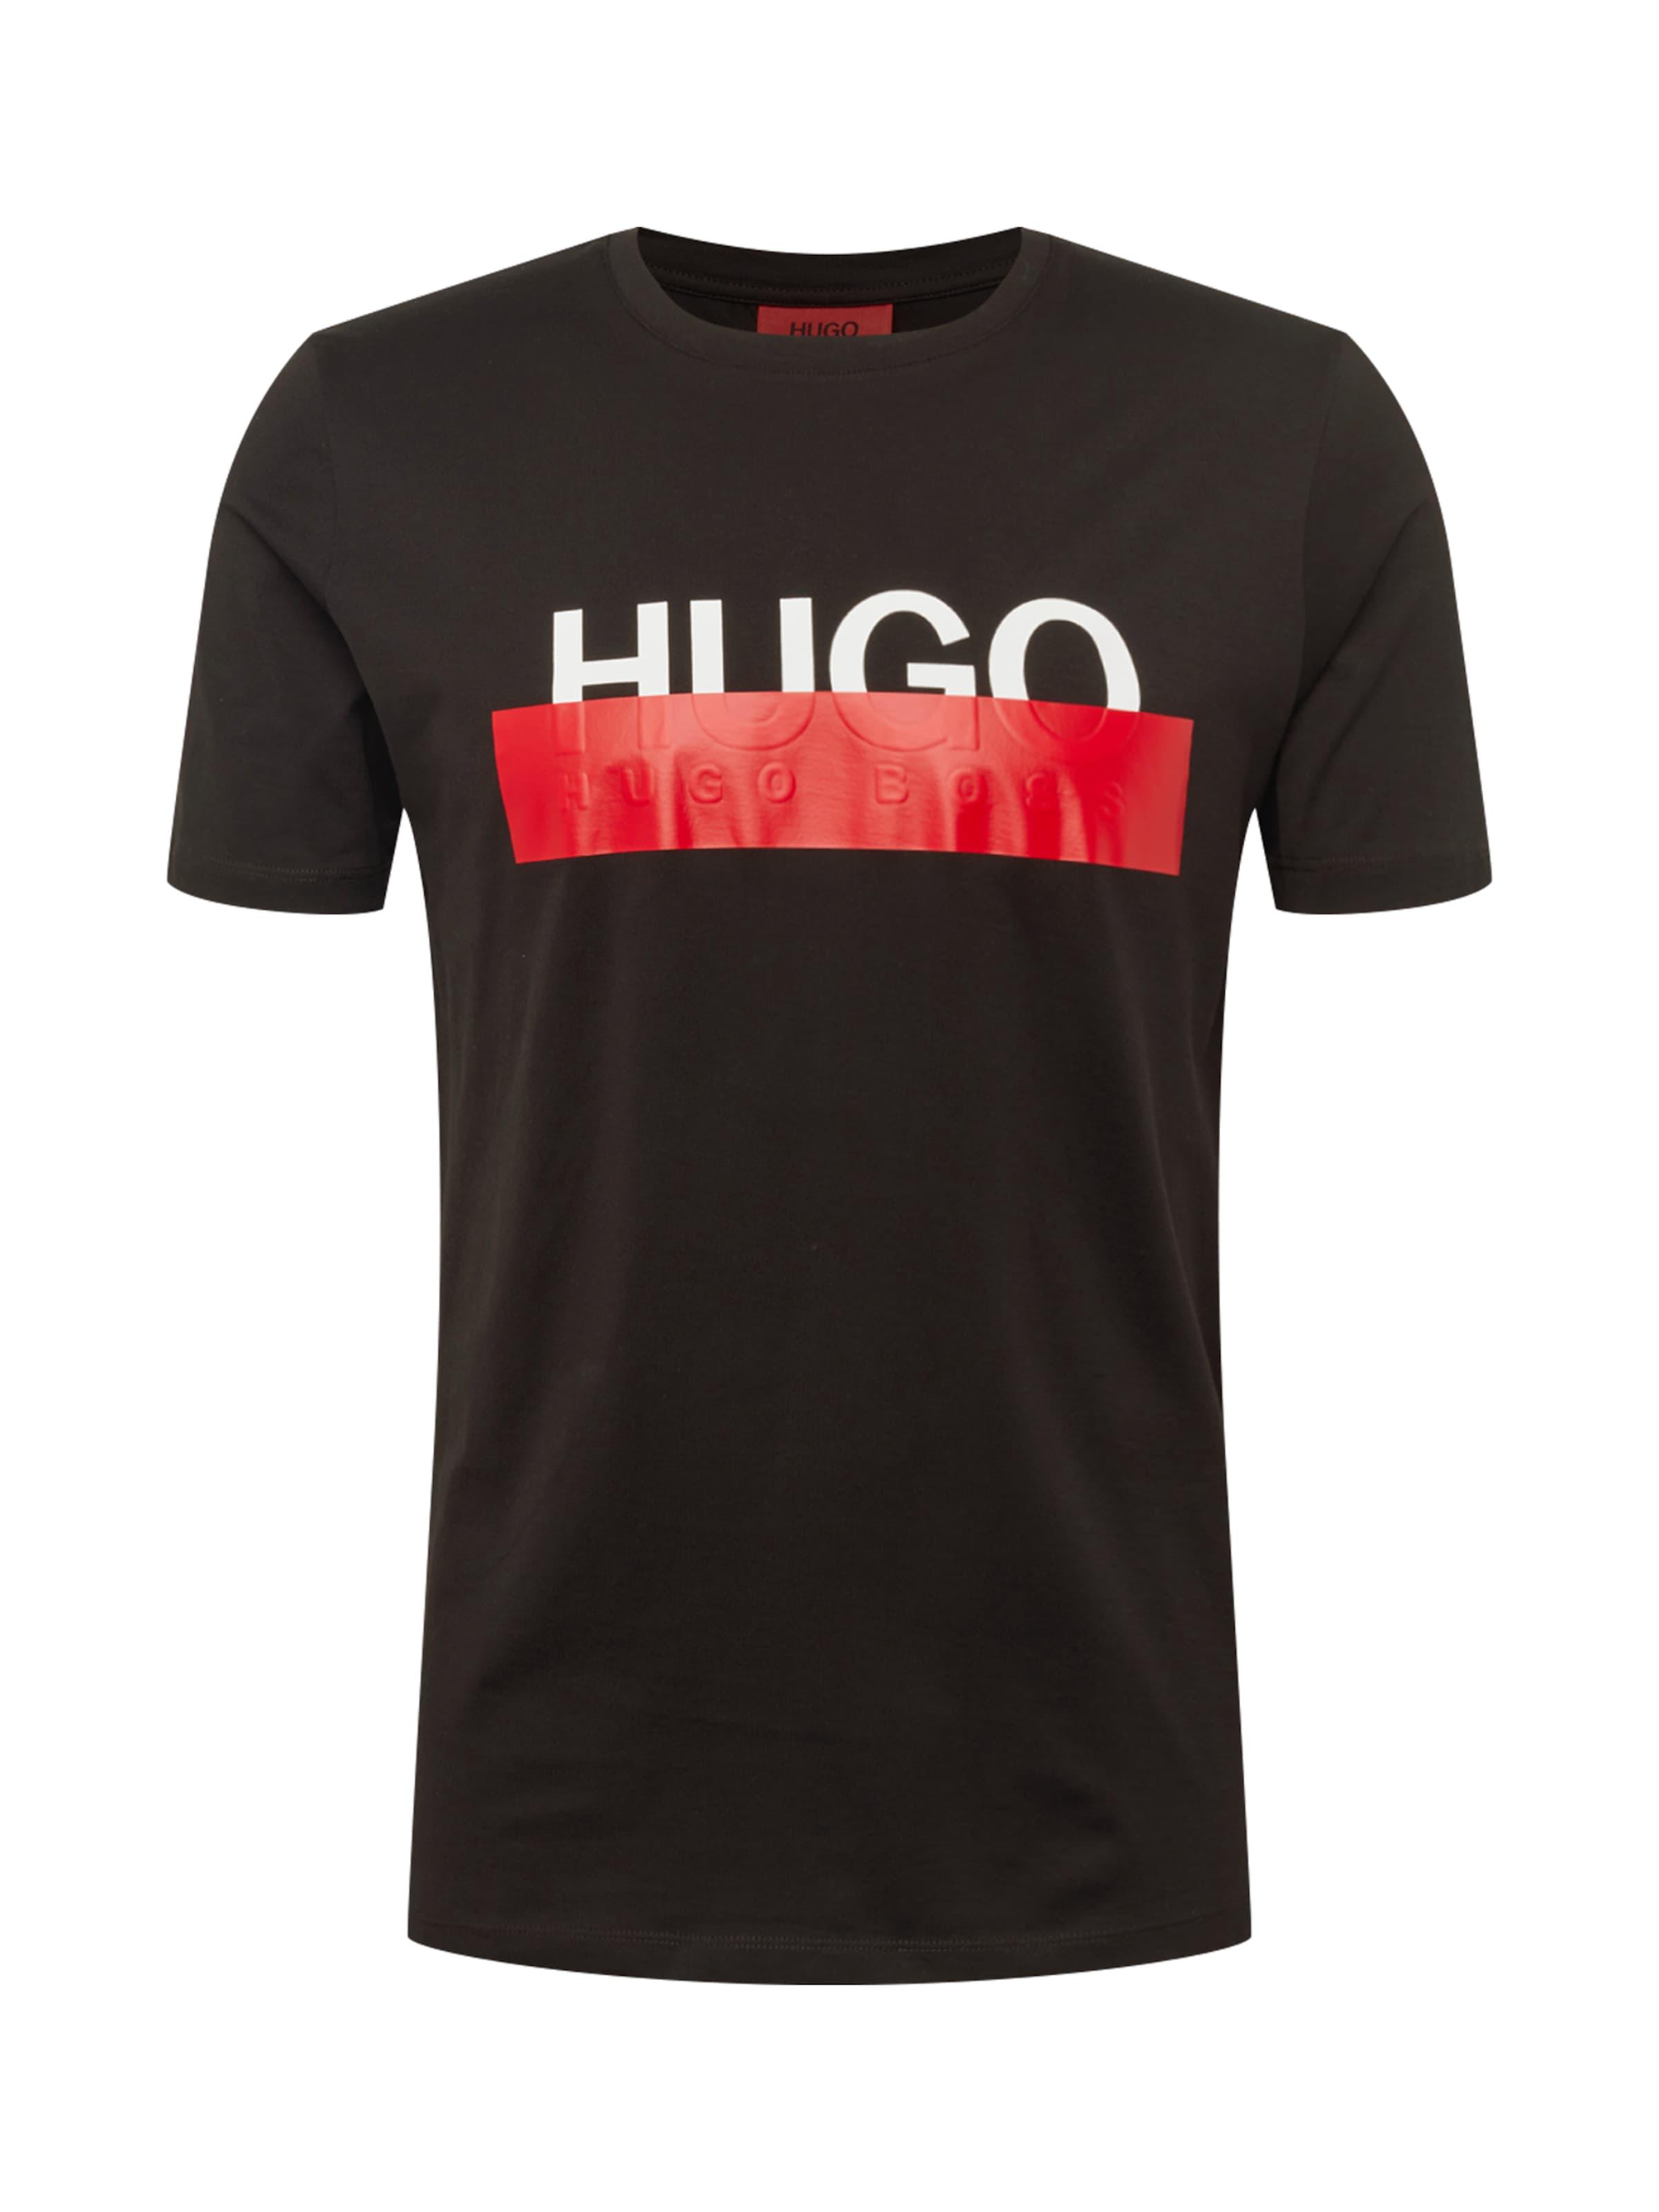 RotSchwarz Weiß Shirt In 'dolive' Hugo dxsQChrt